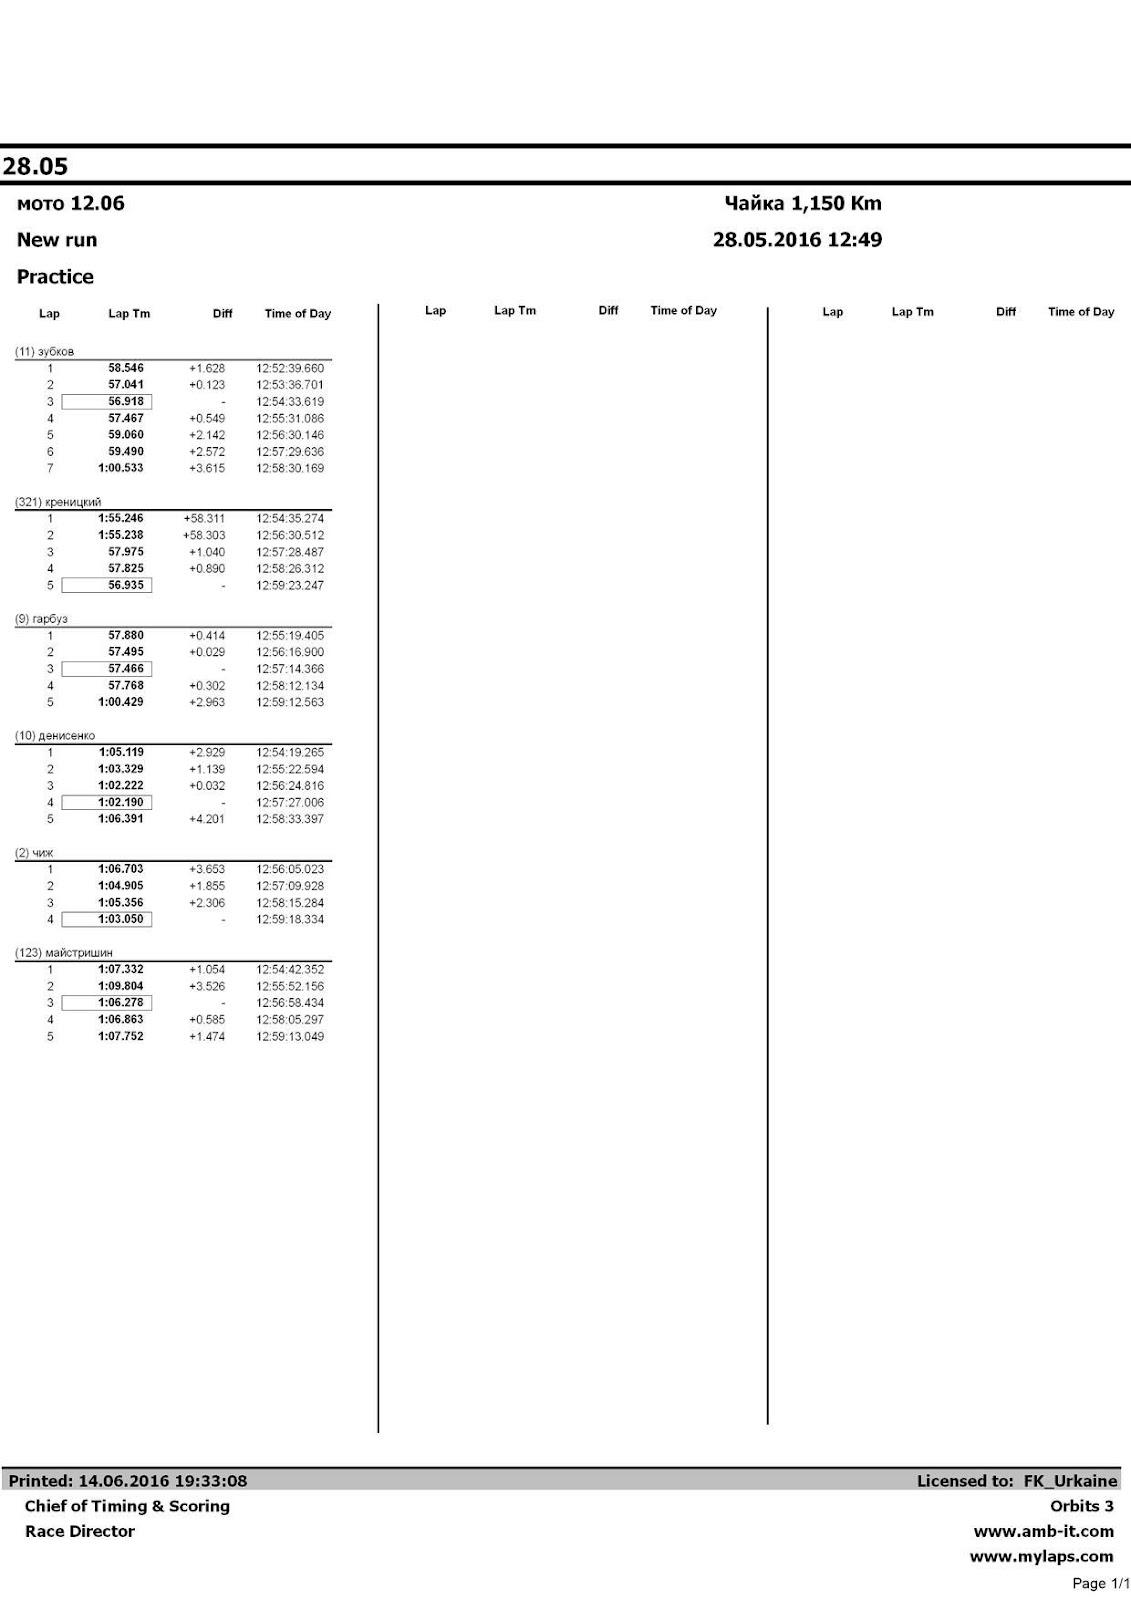 Автоматически созданный замещающий текст: Lap Lap Tm Diff Time of Day Lap Lap Tm Diff Time of Day Lap (11) зубков 1 2 3 4 5 6 7 (321) креницкий 1 2 3 4 5 (9) гарбуз 1 2 3 4 5 (10) денисенко 1 2 3 4 5 (2) чиж 1 2 3 4 (123) майстришин 1 2 3 4 5 Lap Tm 58.546 57.041 56.918 57.467 59.060 59.490 1:00.533 1:55.246 1:55.238 57.975 57.825 56.935 57.880 57.495 57.466 57.768 1:00.429 1:05.119 1:03.329 1:02.222 1:02.190 1:06.391 1:06.703 1:04.905 1:05.356 1:03.050 1:07.332 1:09.804 1:06.278 1:06.863 1:07.752 Diff +1.628 +0.123 - +0.549 +2.142 +2.572 +3.615 +58.311 +58.303 +1.040 +0.890 - +0.414 +0.029 - +0.302 +2.963 +2.929 +1.139 +0.032 - +4.201 +3.653 +1.855 +2.306 - +1.054 +3.526 - +0.585 +1.474 Time of Day 12:52:39.660 12:53:36.701 12:54:33.619 12:55:31.086 12:56:30.146 12:57:29.636 12:58:30.169 12:54:35.274 12:56:30.512 12:57:28.487 12:58:26.312 12:59:23.247 12:55:19.405 12:56:16.900 12:57:14.366 12:58:12.134 12:59:12.563 12:54:19.265 12:55:22.594 12:56:24.816 12:57:27.006 12:58:33.397 12:56:05.023 12:57:09.928 12:58:15.284 12:59:18.334 12:54:42.352 12:55:52.156 12:56:58.434 12:58:05.297 12:59:13.049 28.05 мото 12.06 New run Practice Чайка 1,150 Km 28.05.2016 12:49 Printed: 14.06.2016 19:33:08 Chief of Timing & Scoring Race Director Licensed to: FK_Urkaine Orbits 3 www.amb-it.com www.mylaps.com Page 1/1